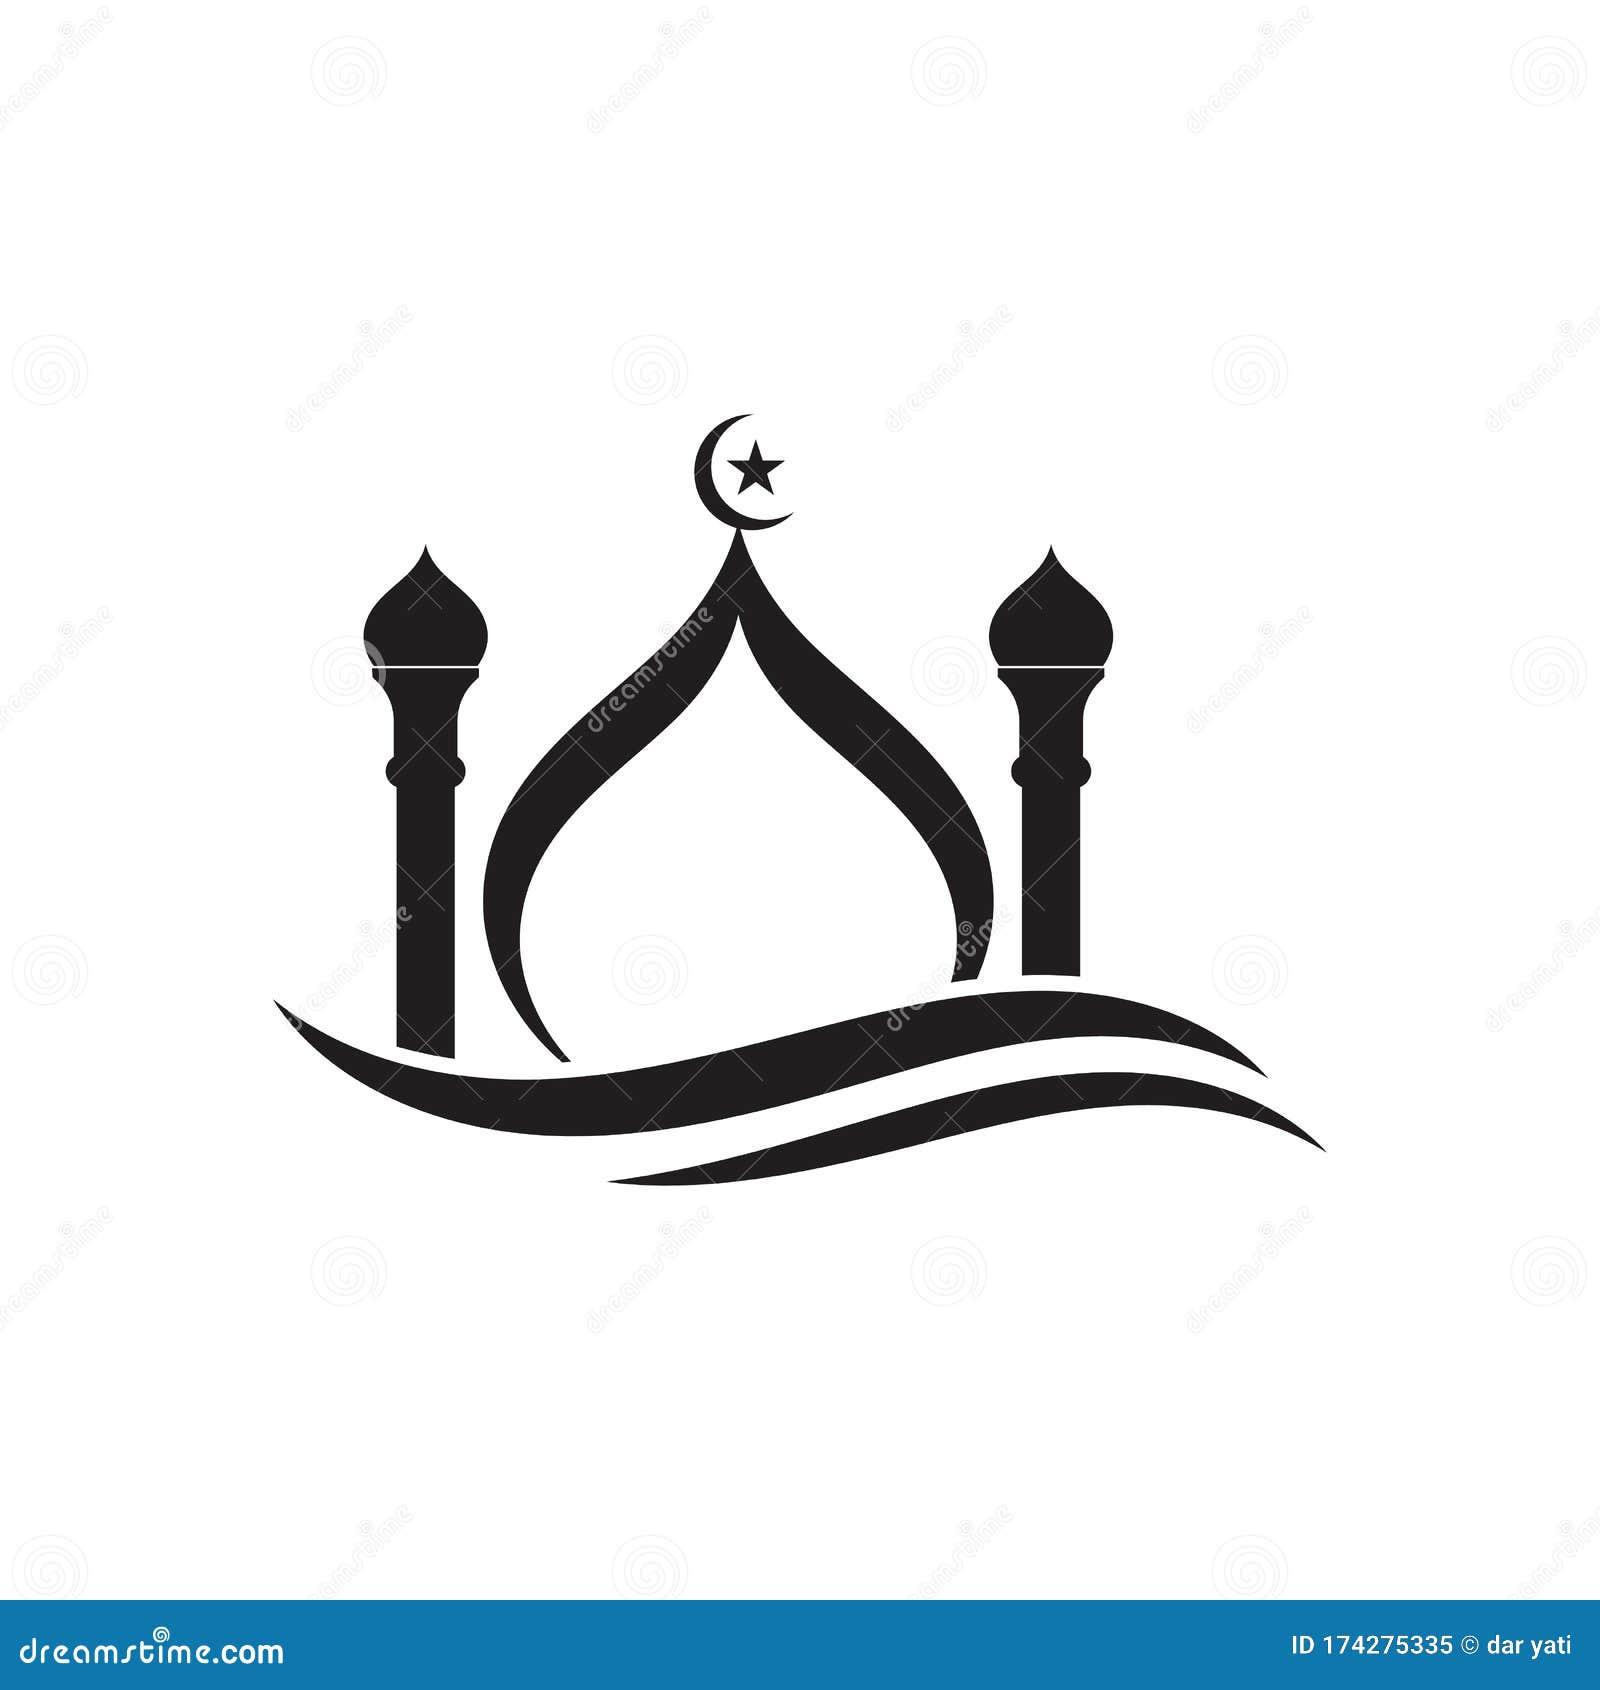 islamic mosque logo vector icon stock vector illustration of islam muslim 174275335 dreamstime com